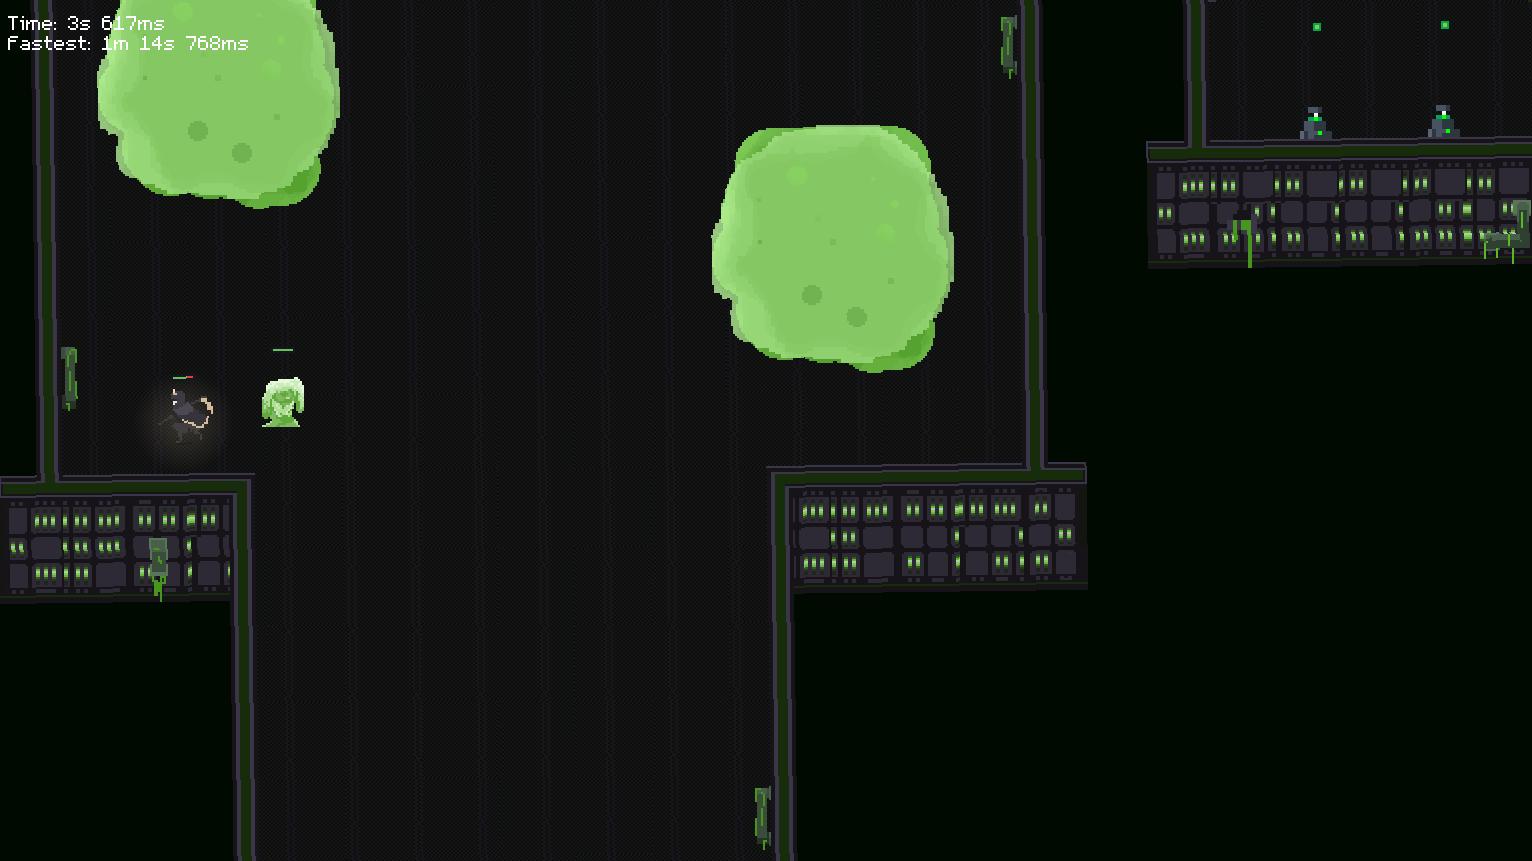 Screenshot 02.png